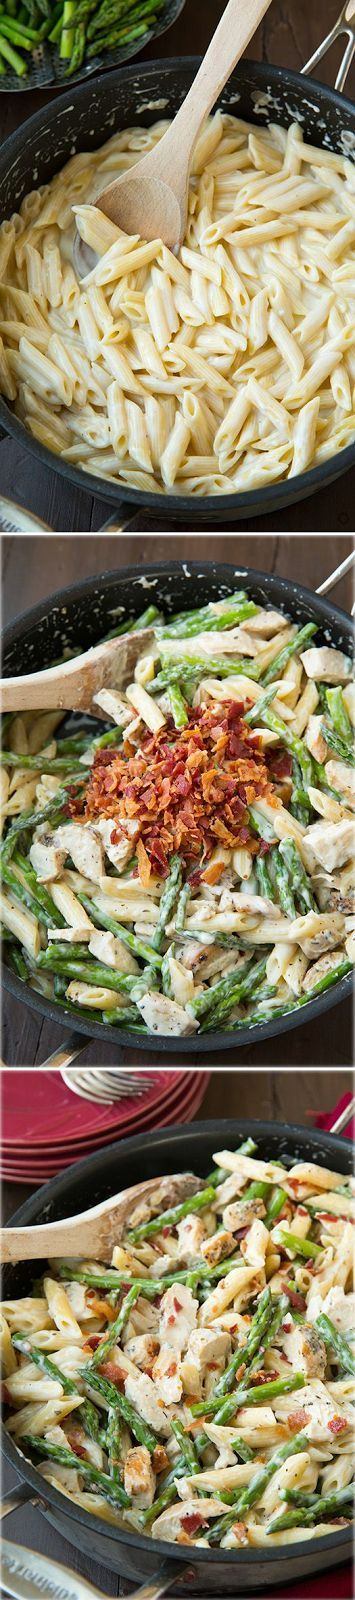 creamy chicken and asparagus pasta w/ bacon